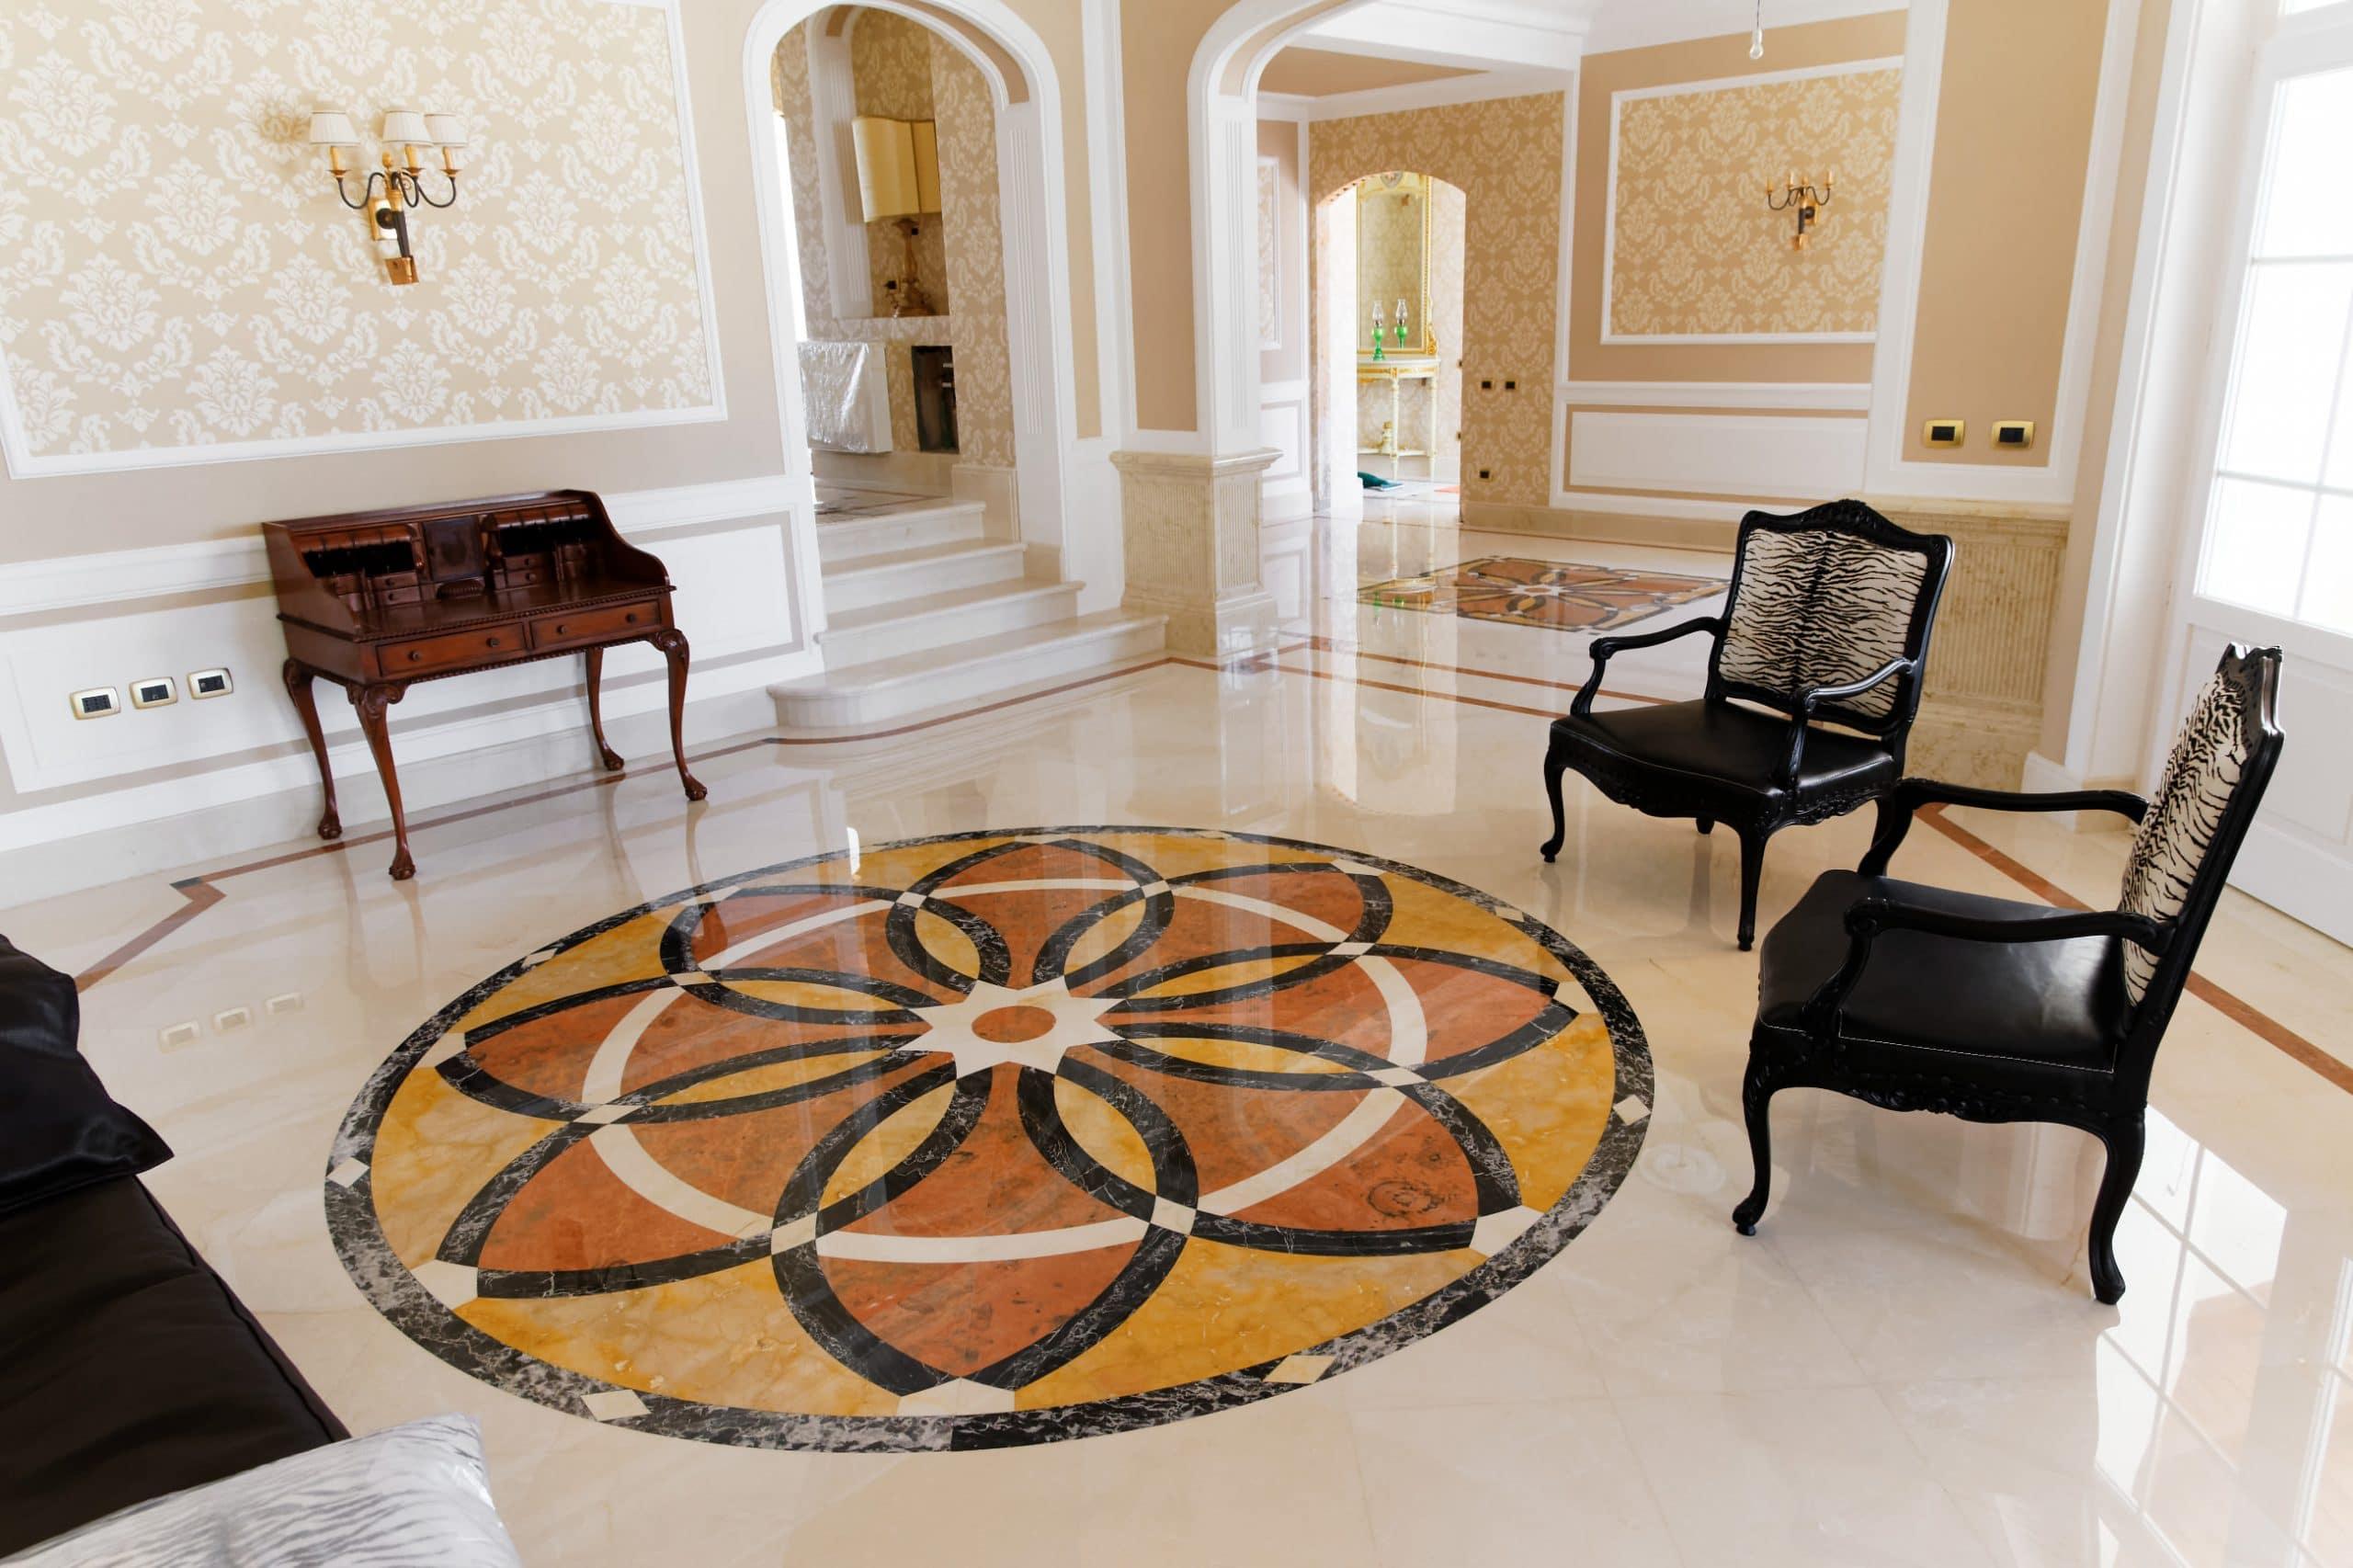 villa pavimento marmo intarsio carpet avorio 5 scaled